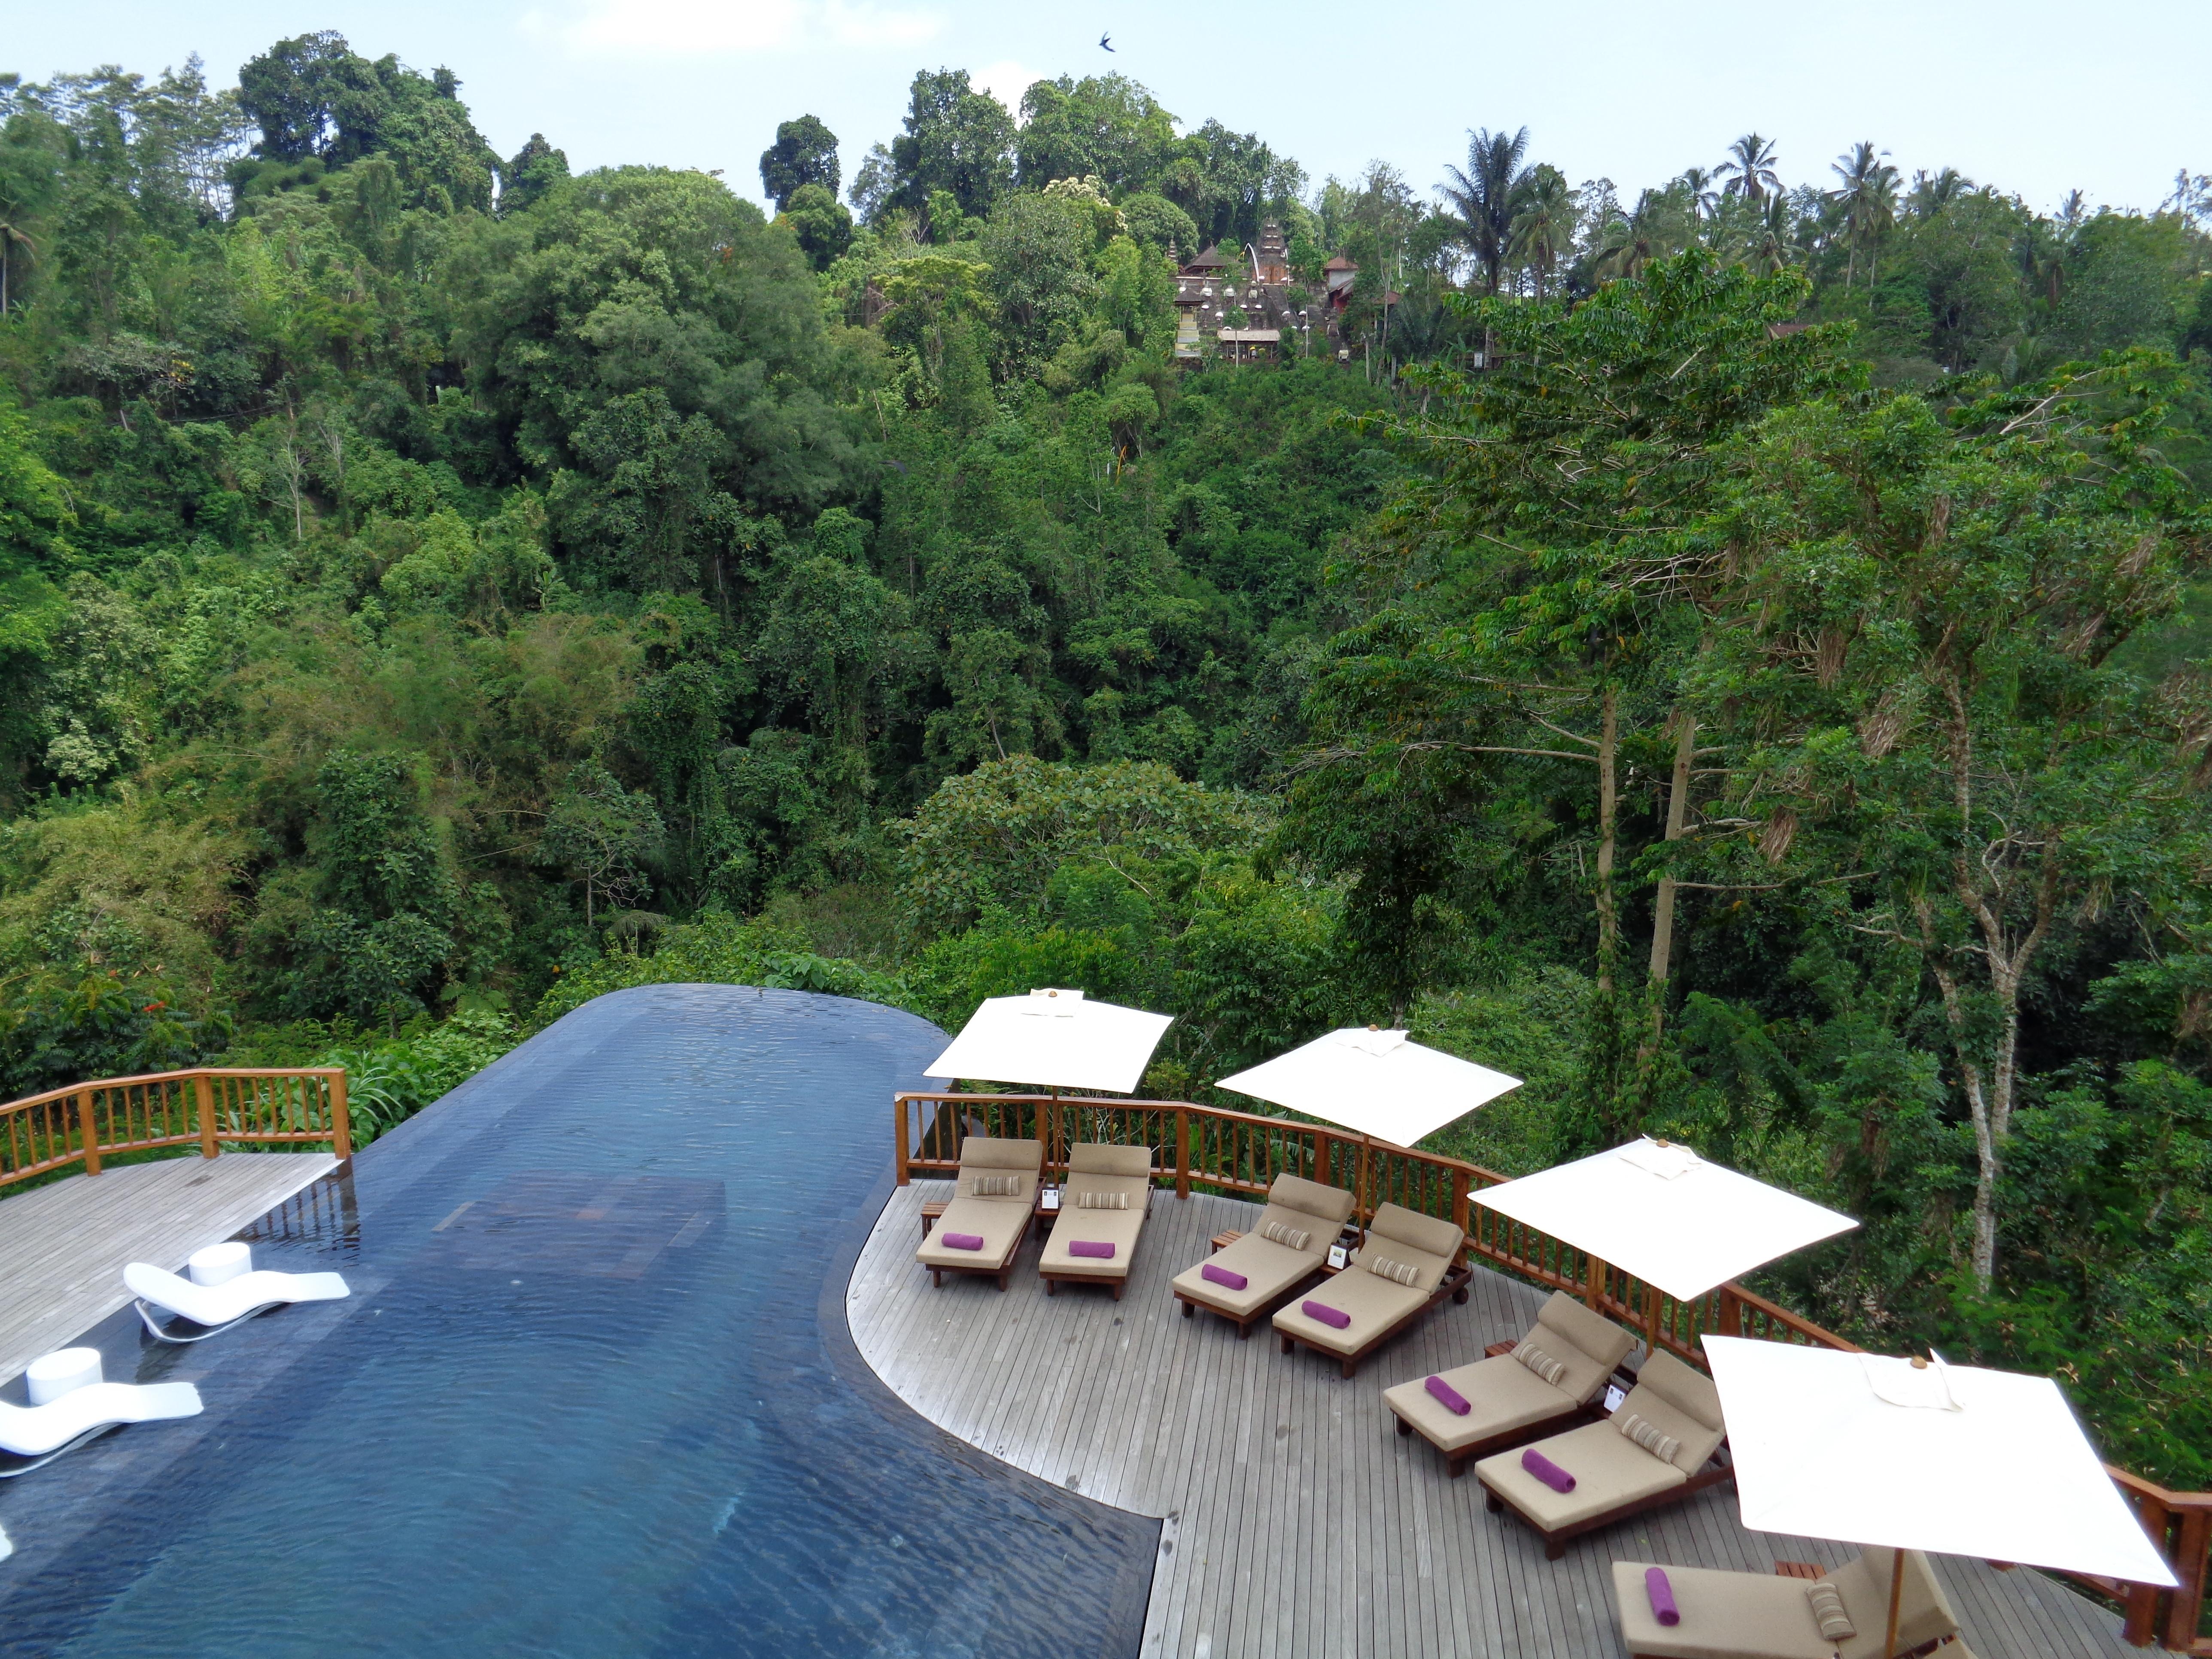 Superieur The Most Beautiful Hotel In Bali U2013 Hanging Gardens Ubud